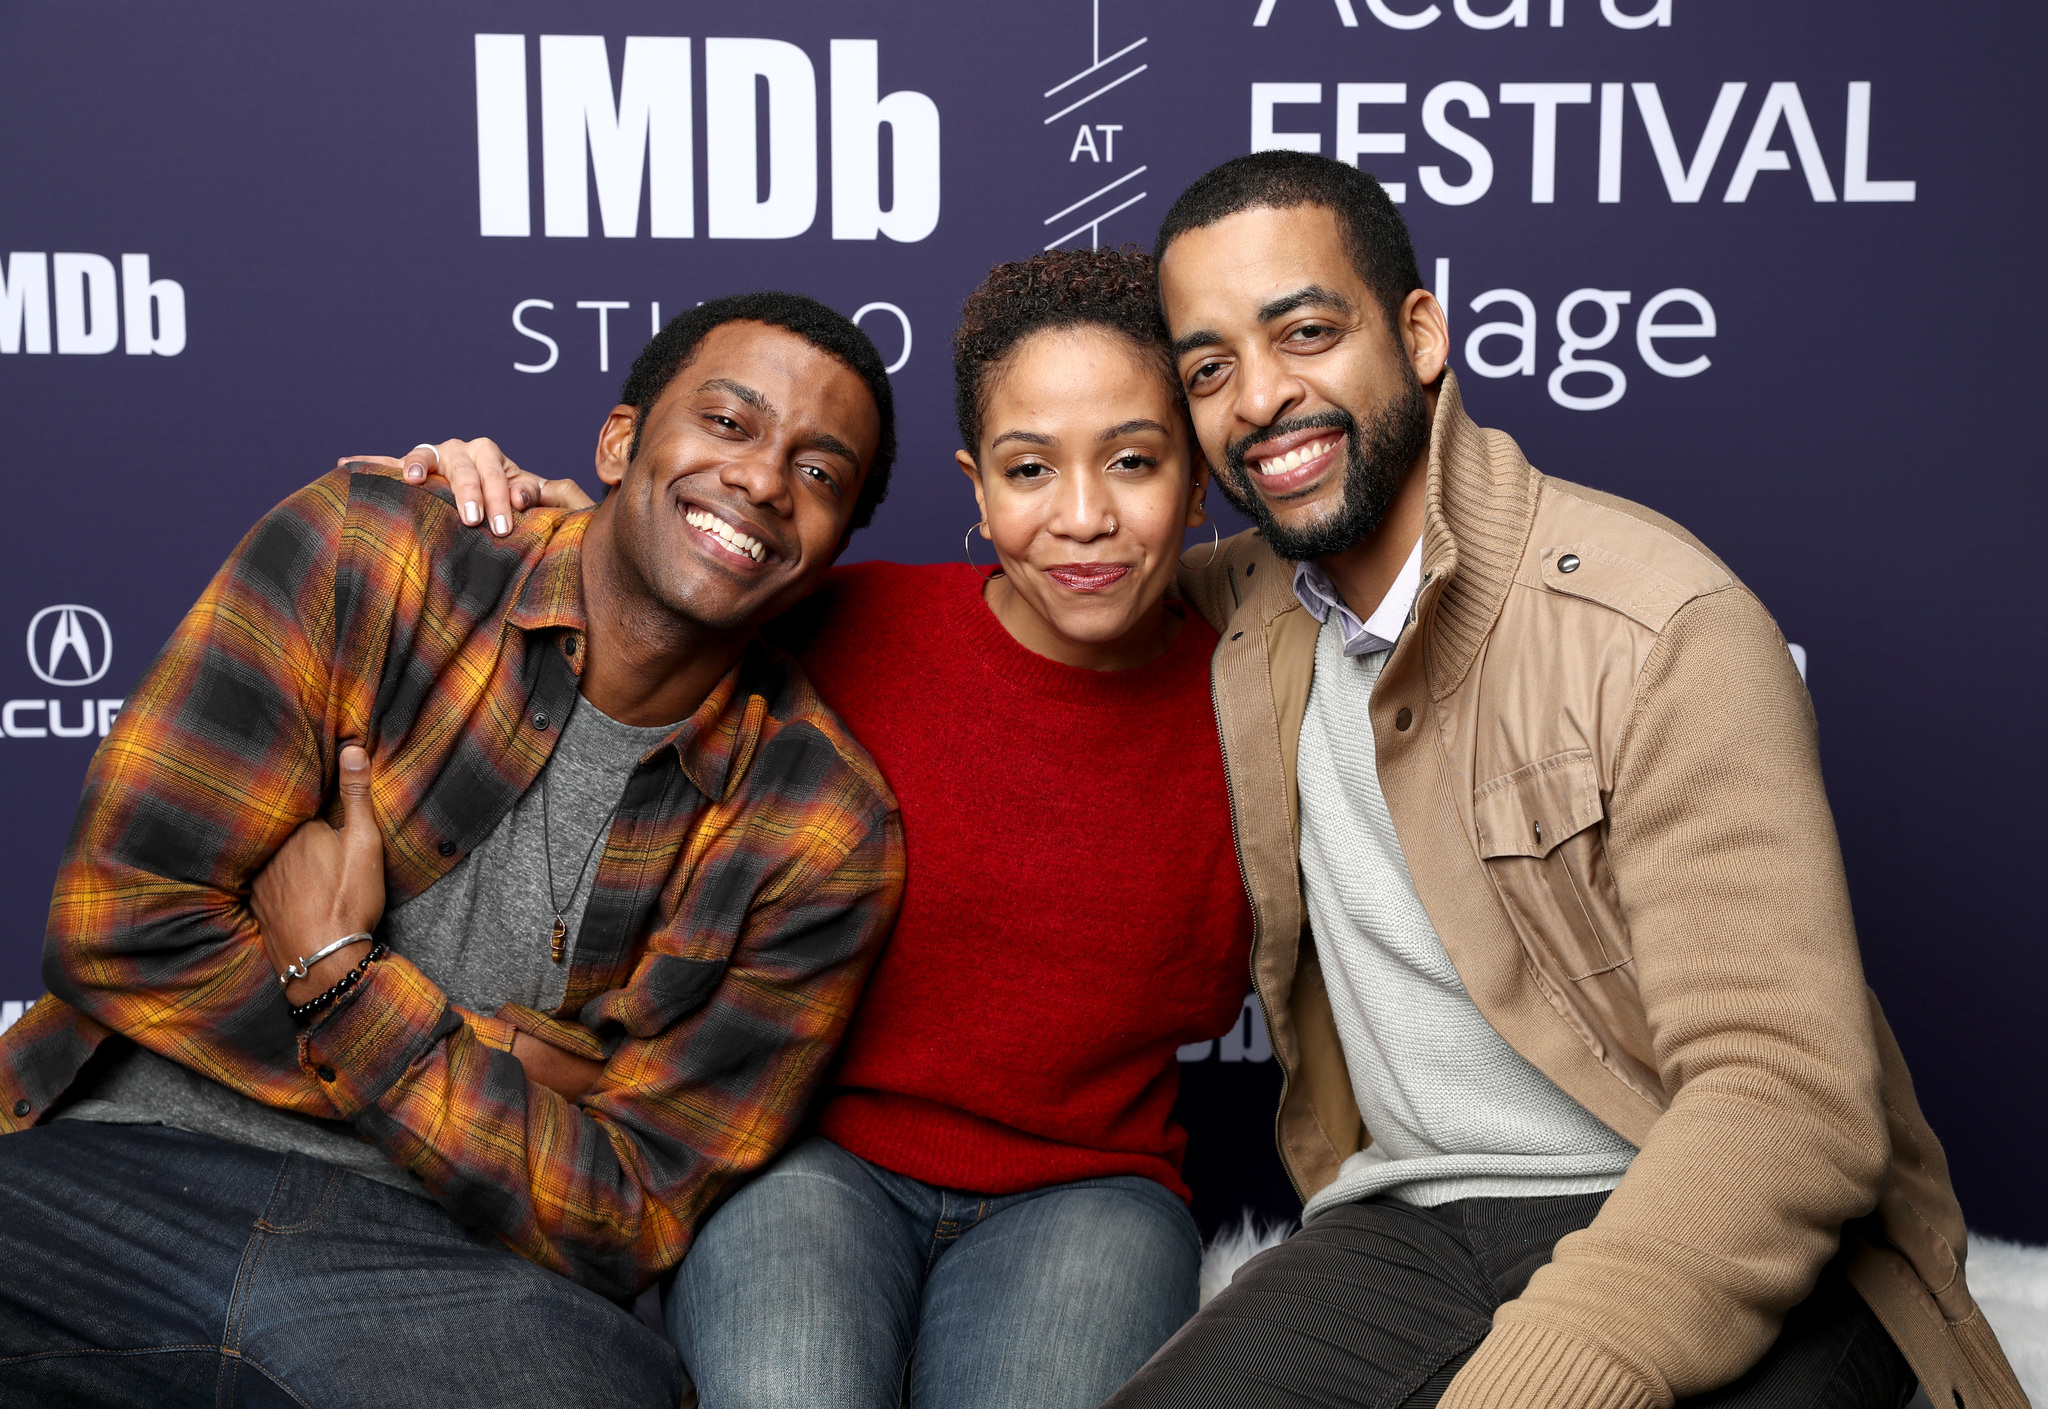 Rashaad Ernesto Green, Zora Howard, and Joshua Boone at an event for The IMDb Studio at Sundance (2015)